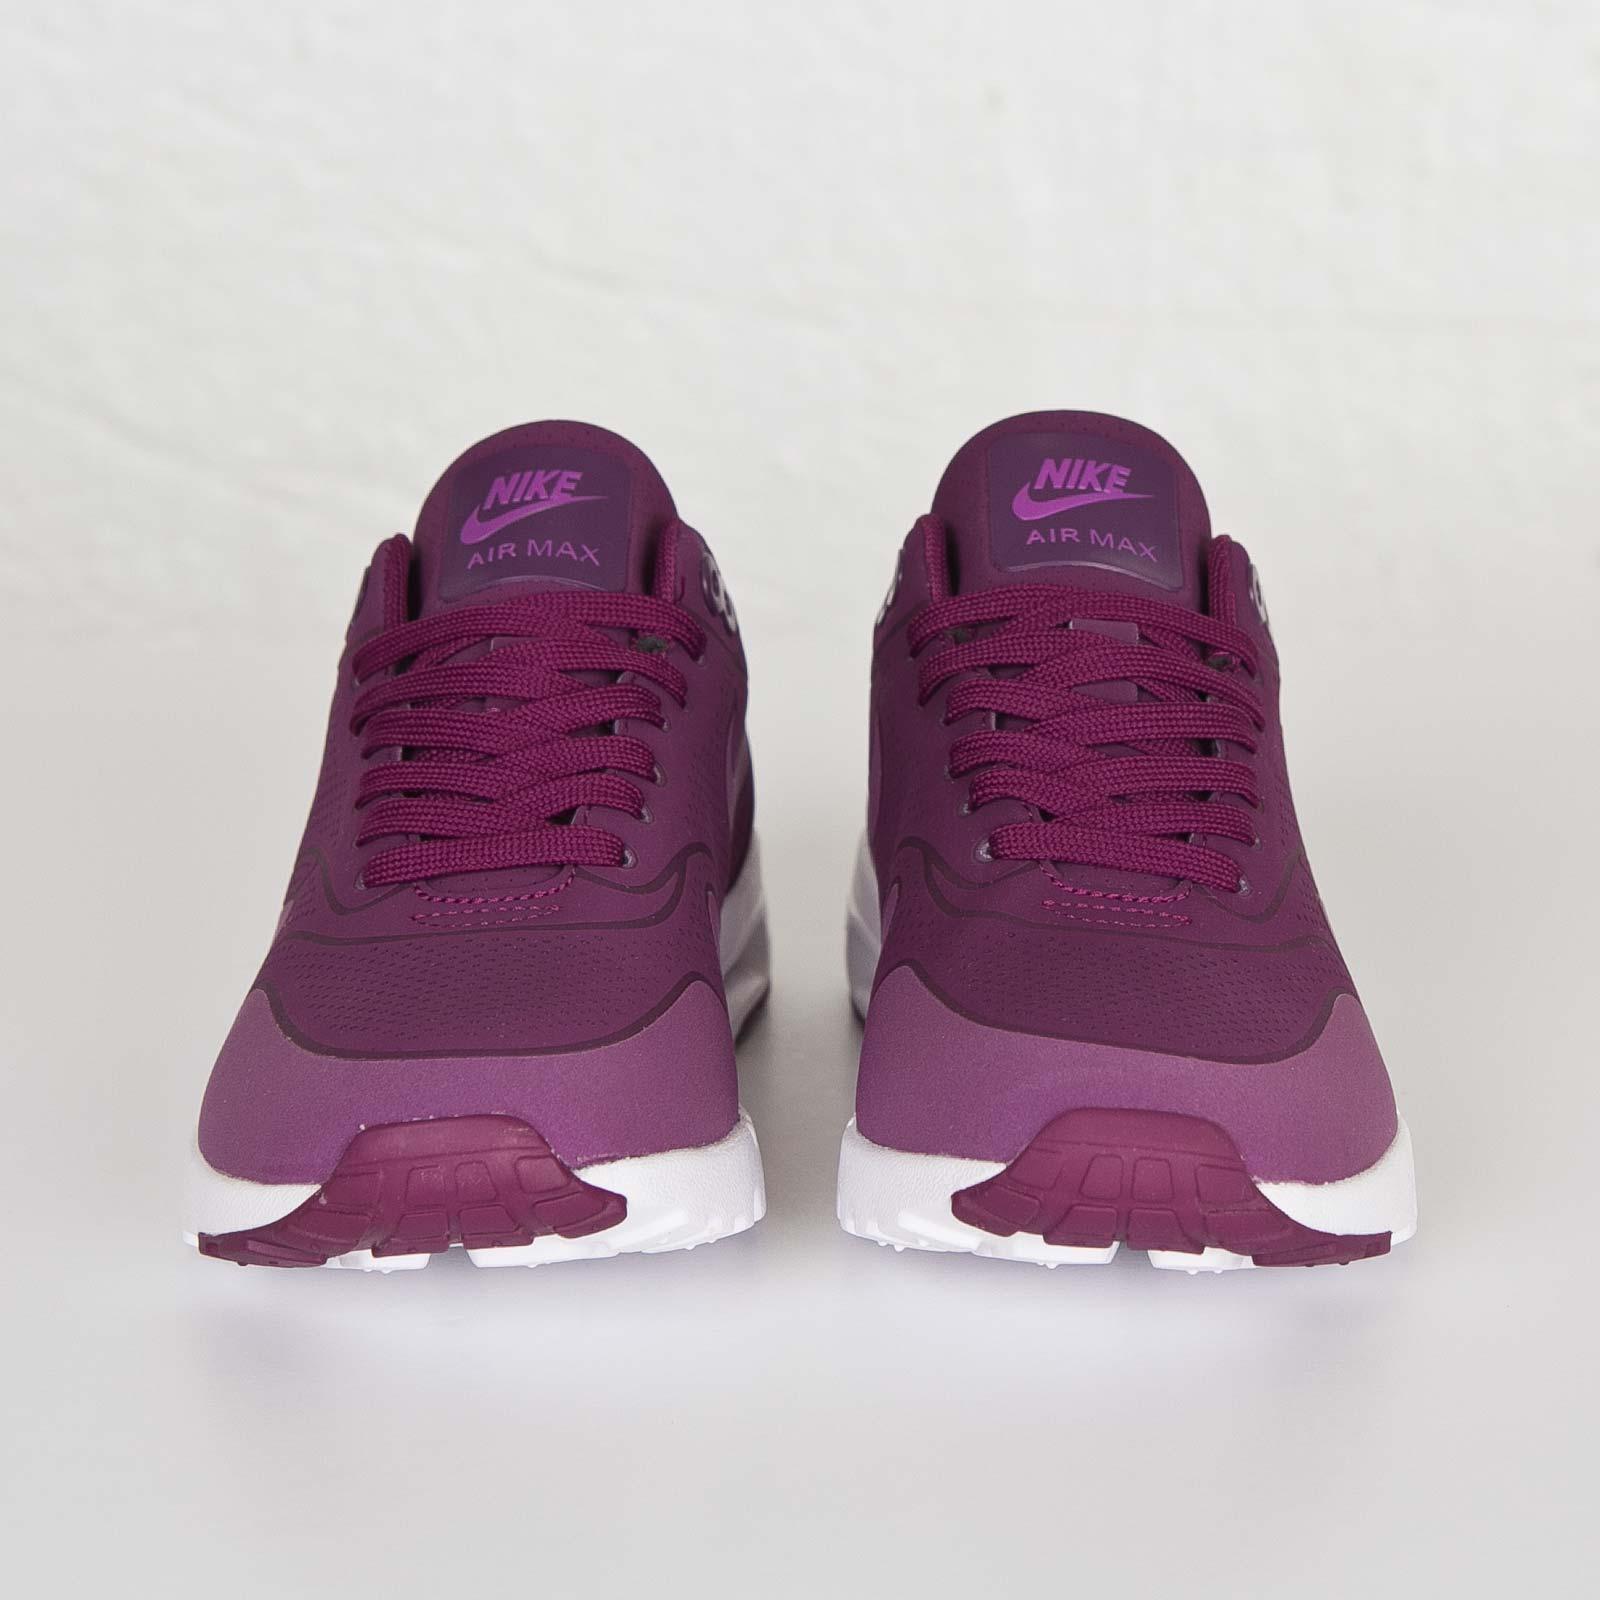 innovative design 077c5 f3bd4 Nike Wmns Air Max 1 Ultra Moire - 704995-500 - Sneakersnstuff   sneakers    streetwear online since 1999